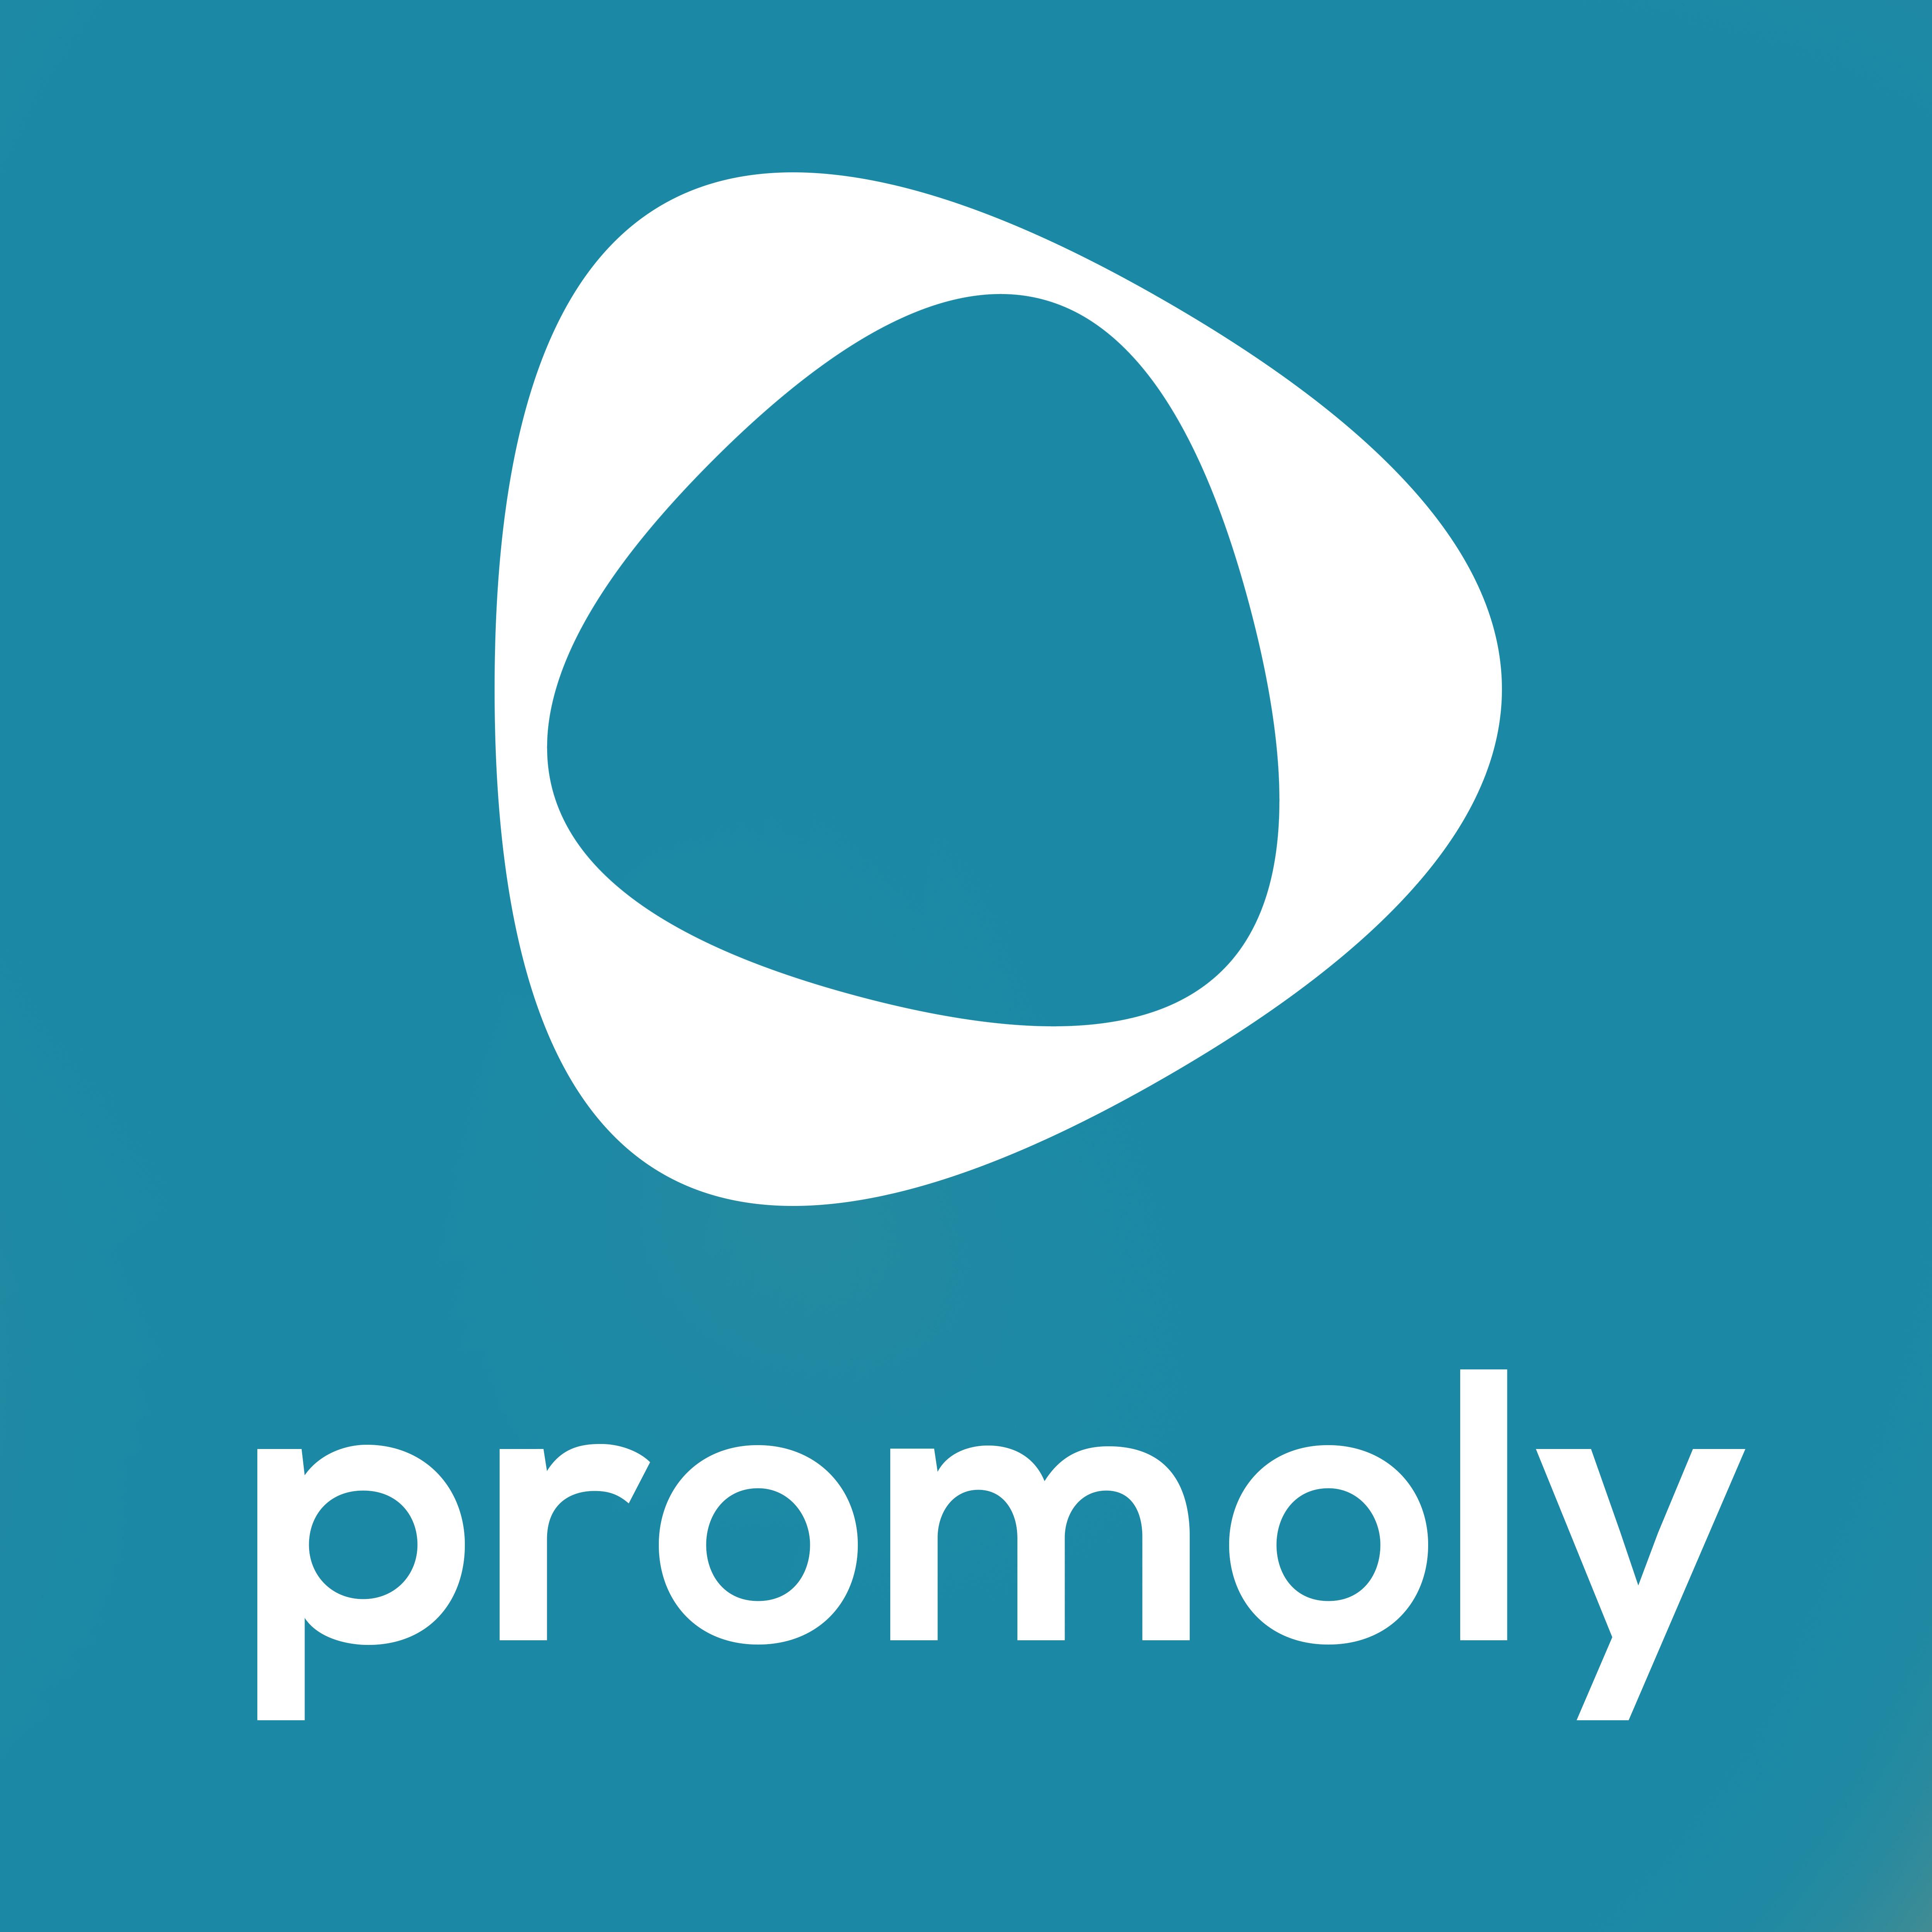 PROMO.LY BLOG